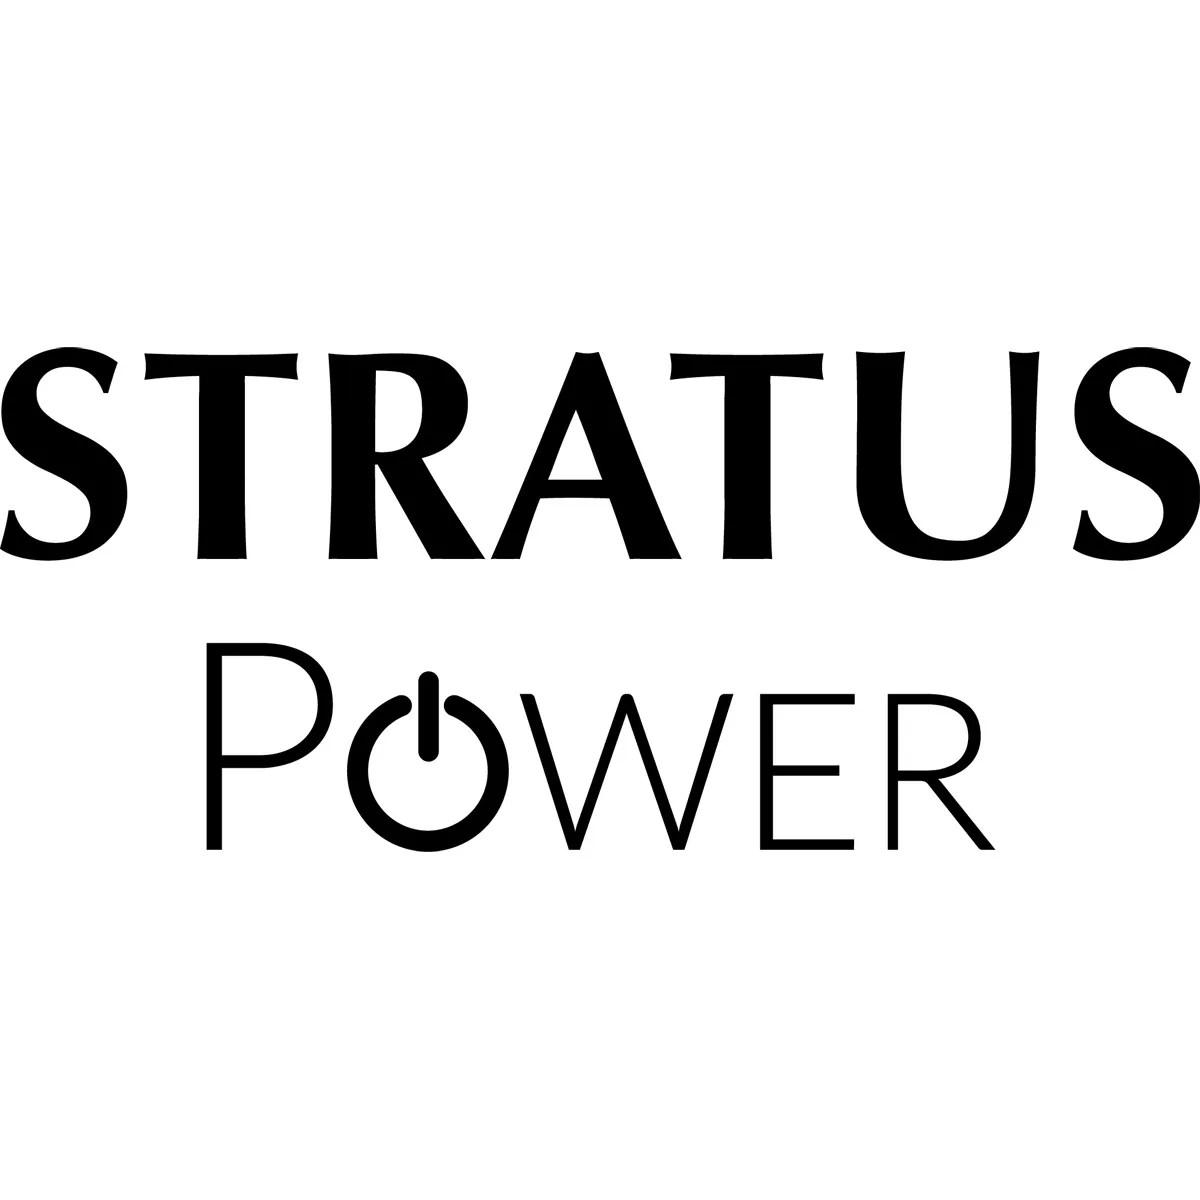 Stratus Power Certified Usb Charging Port